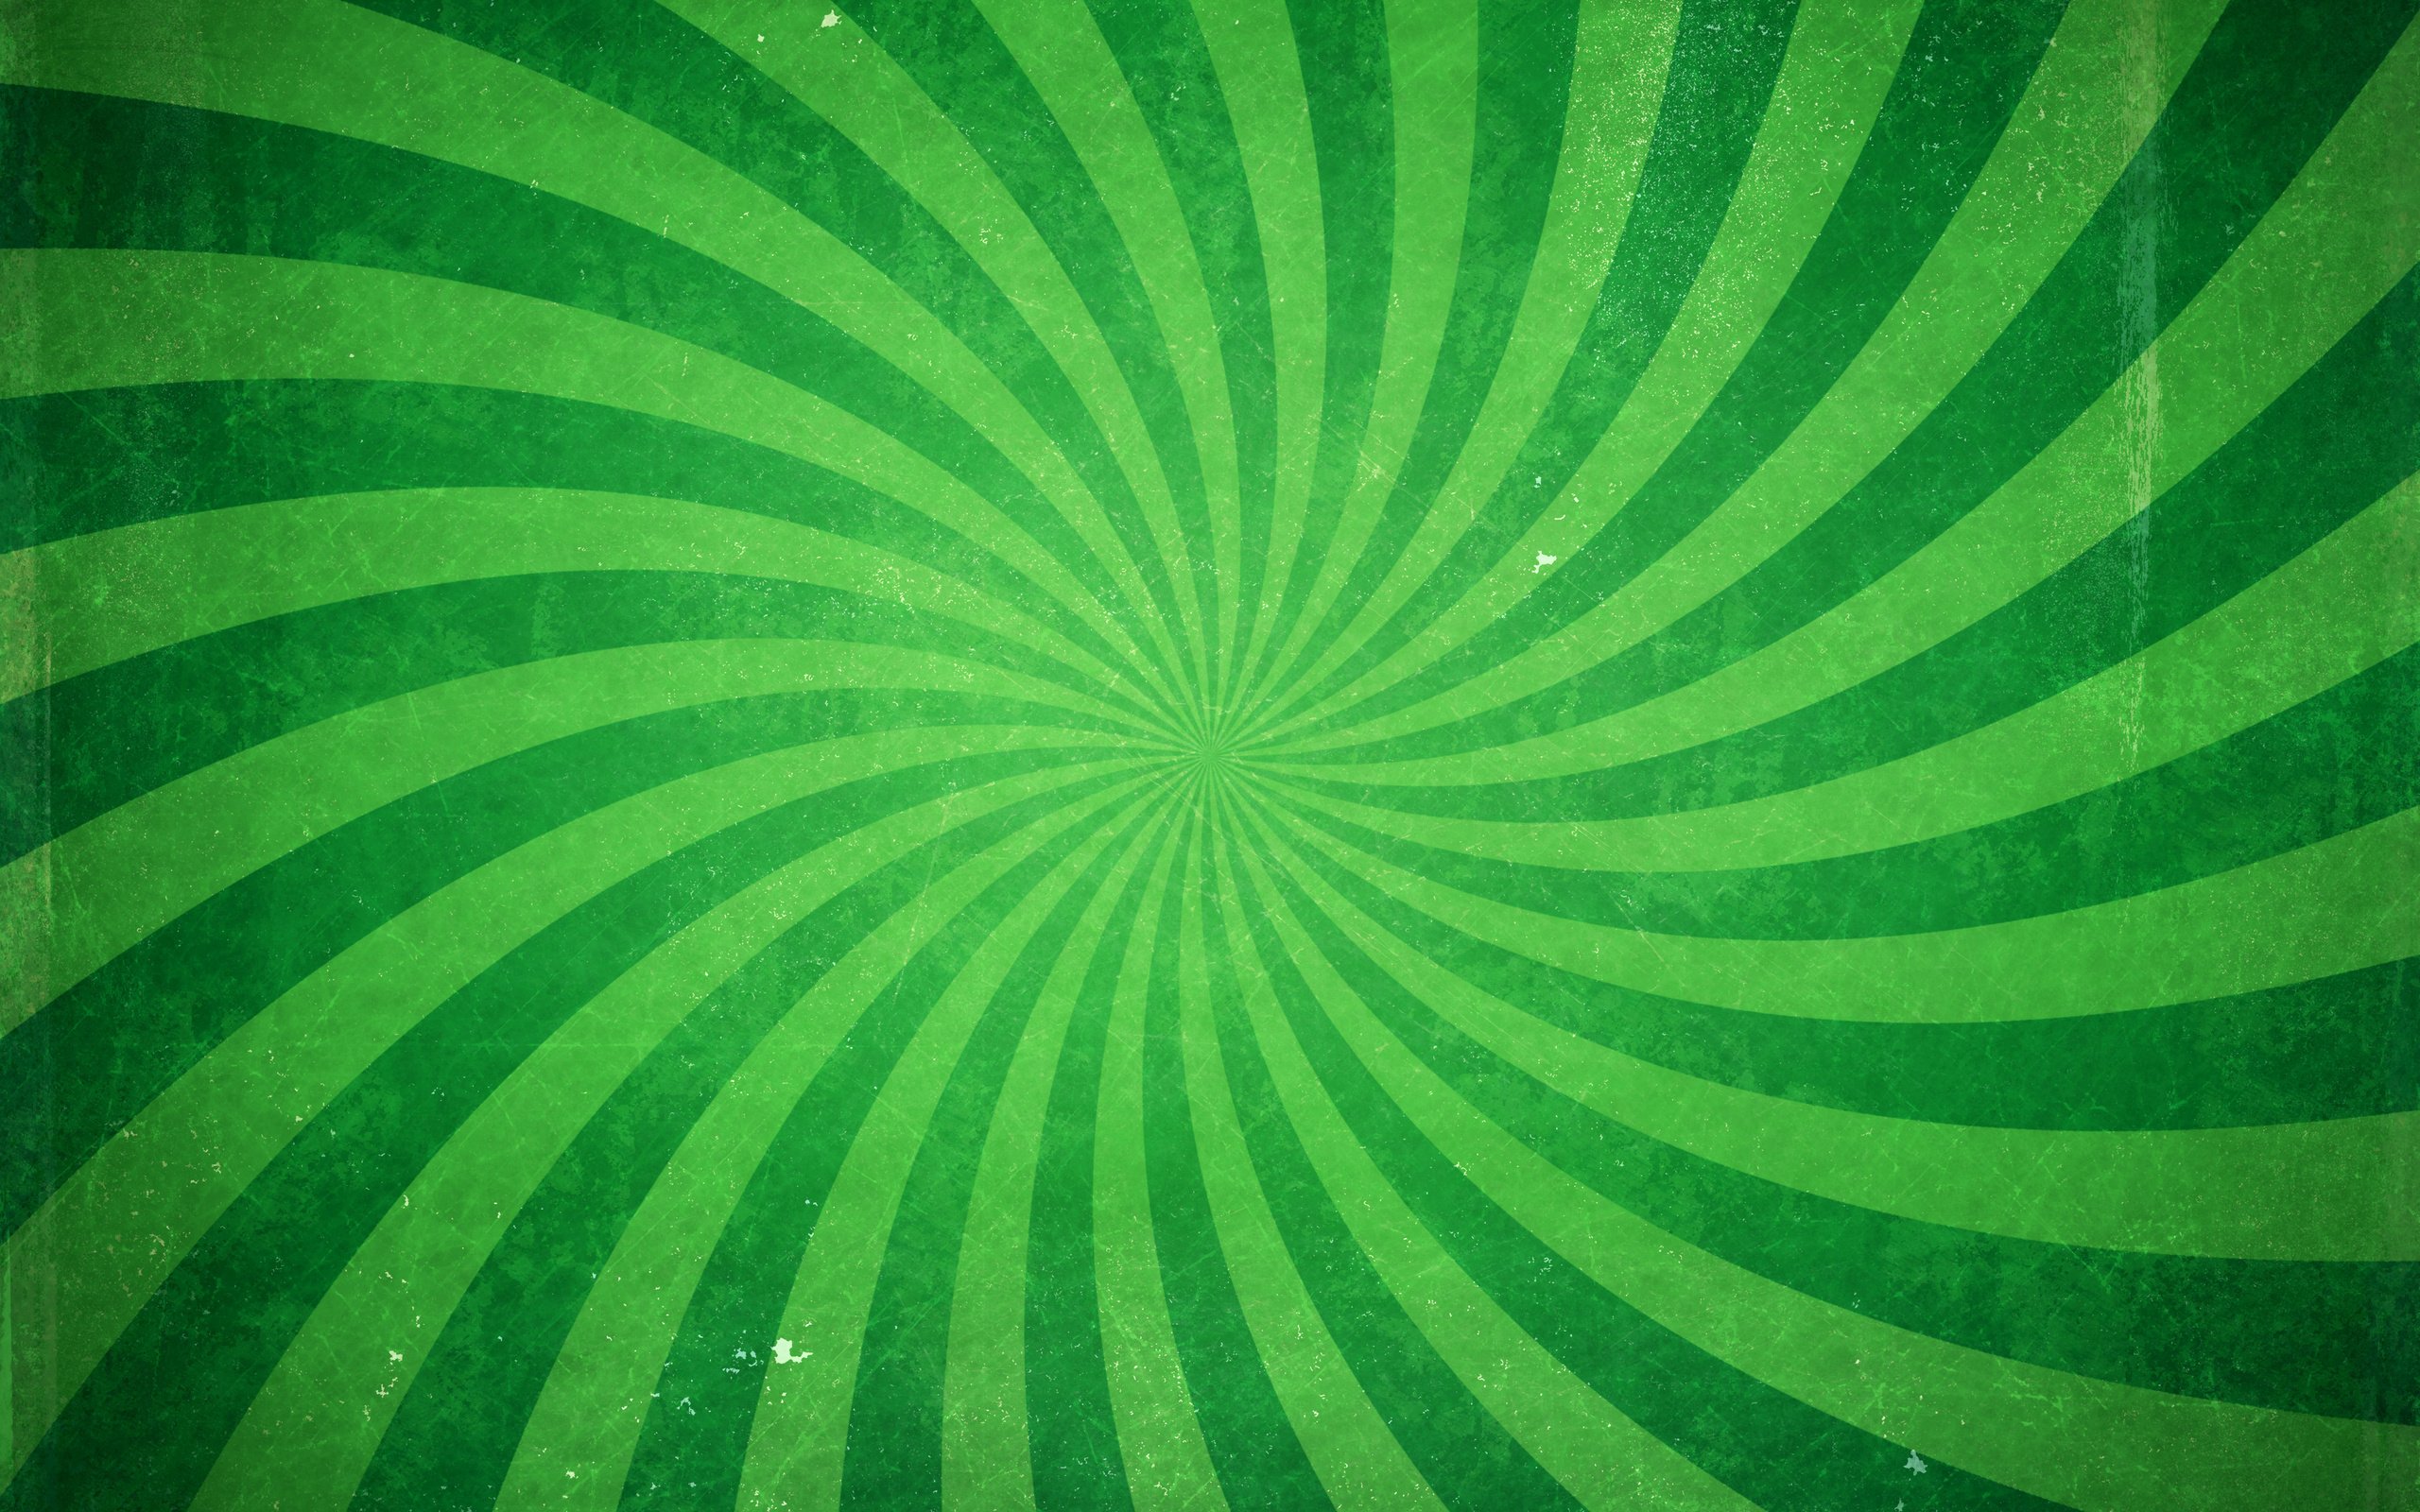 Green And Black Wallpaper 35 High Resolution Wallpaper ...